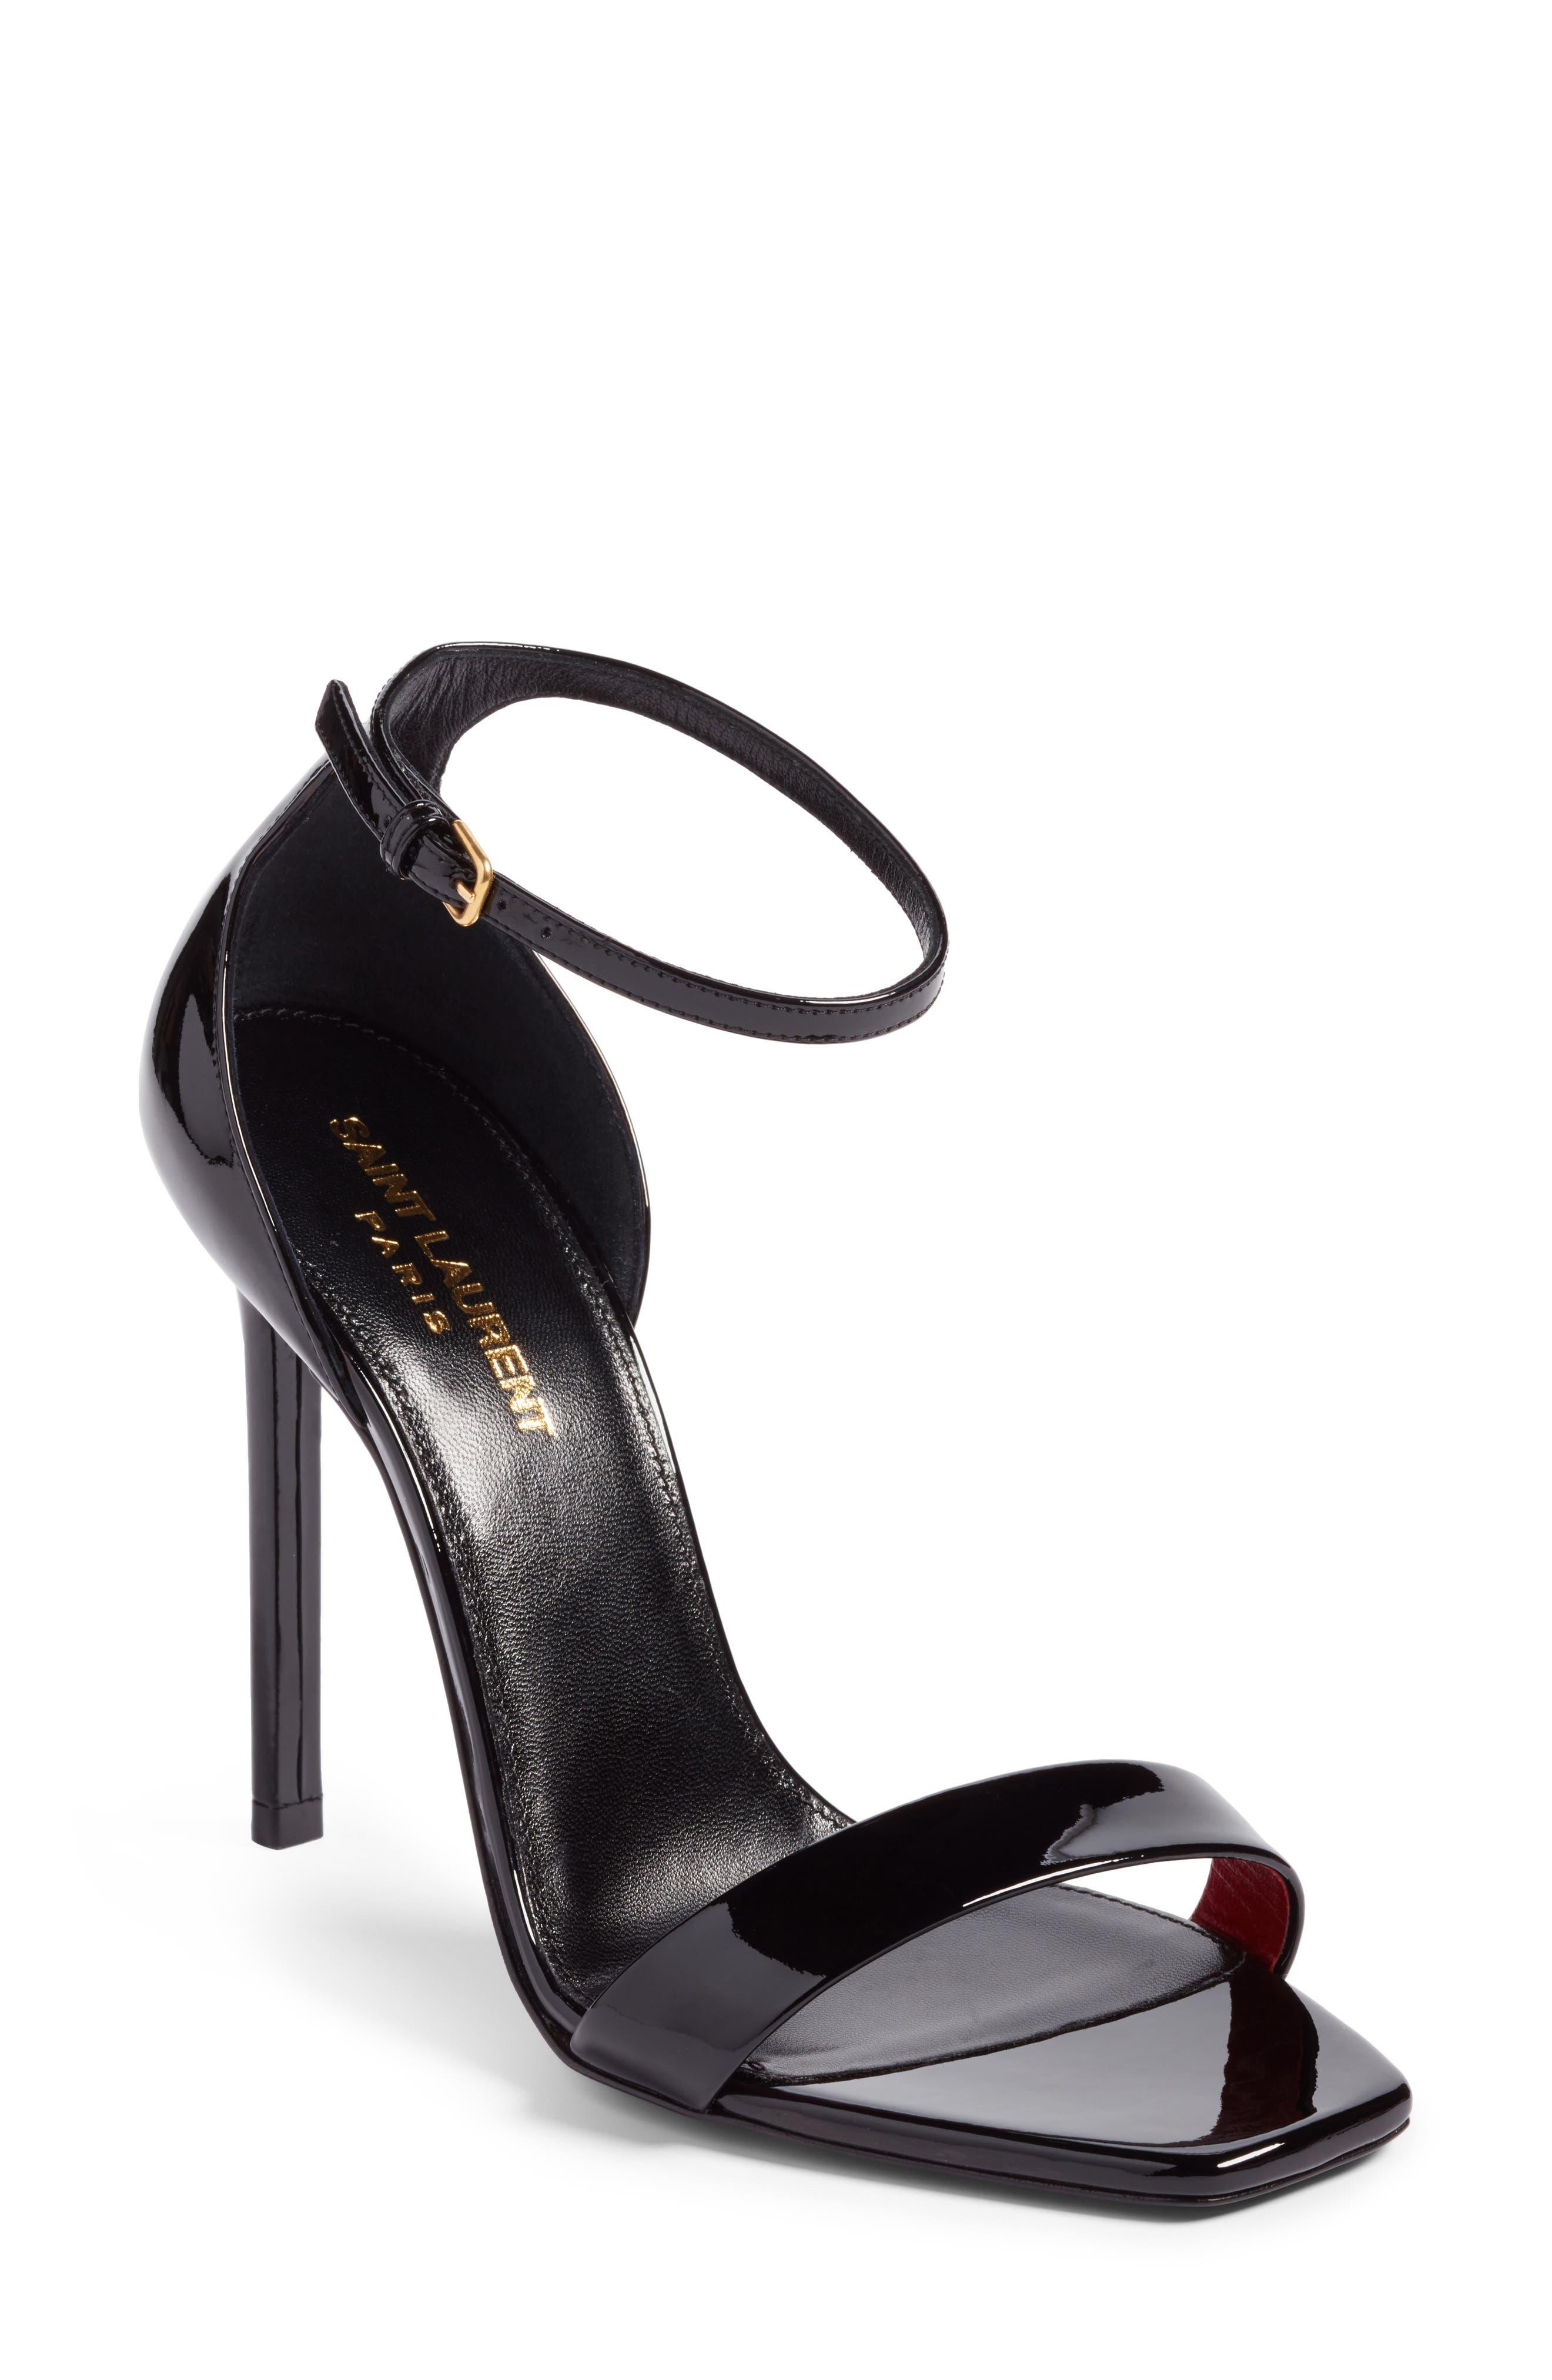 Alternate Image 1 Selected - Saint Laurent Amber Ankle Strap Sandal (Women)